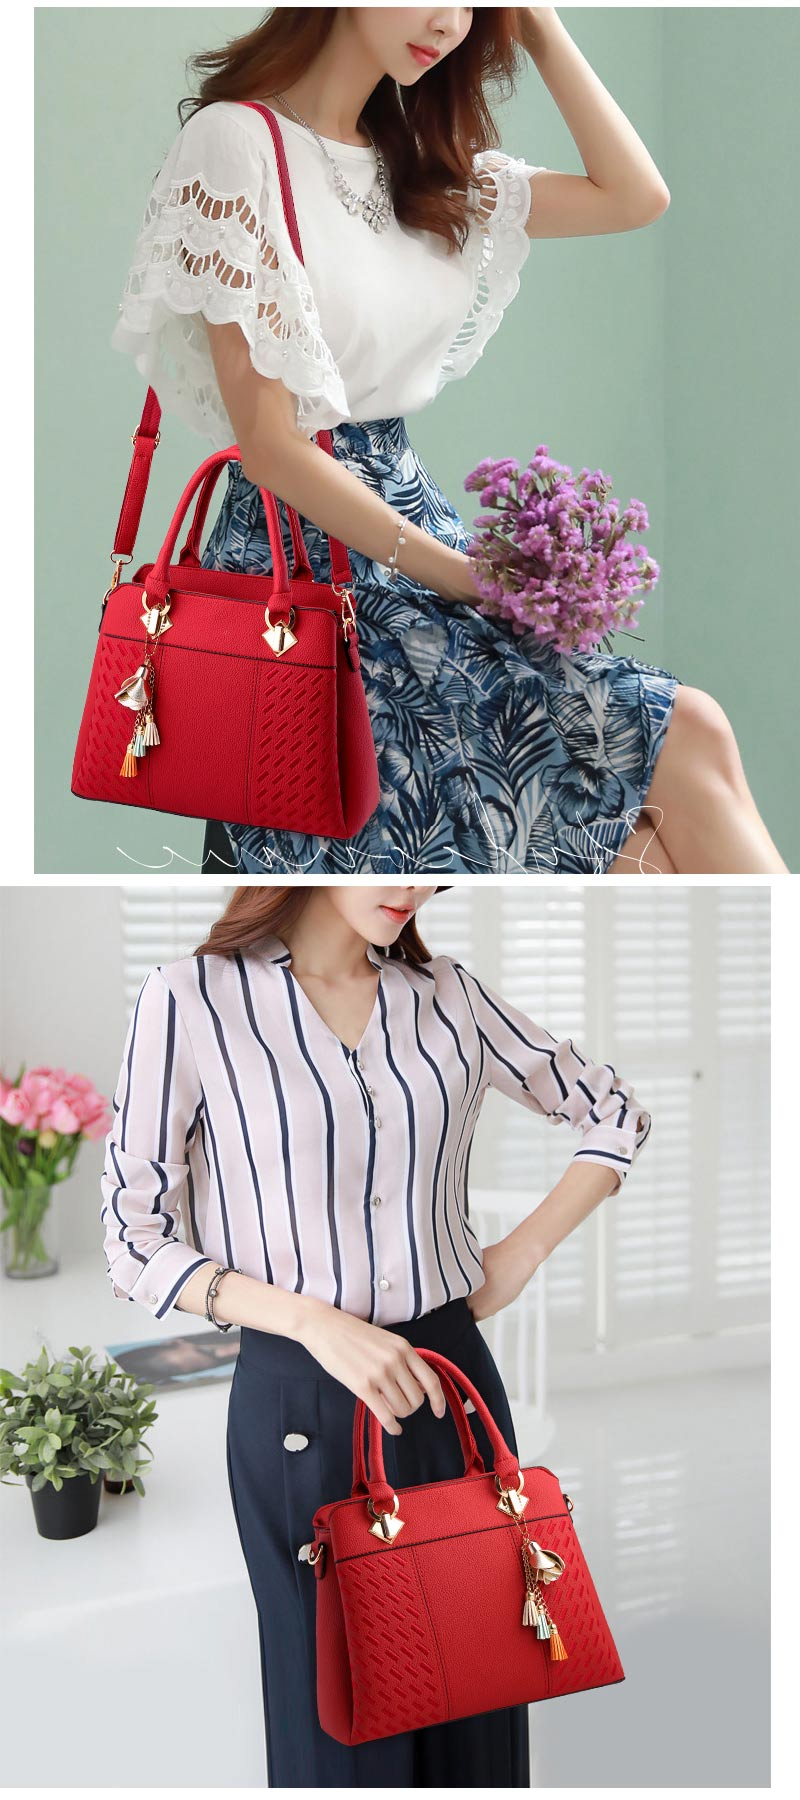 STSR Leather Clutch Bag Female Handbag Luxury Beach Tote Ms. Fringe Shoulder Bag Tote gray one size 21